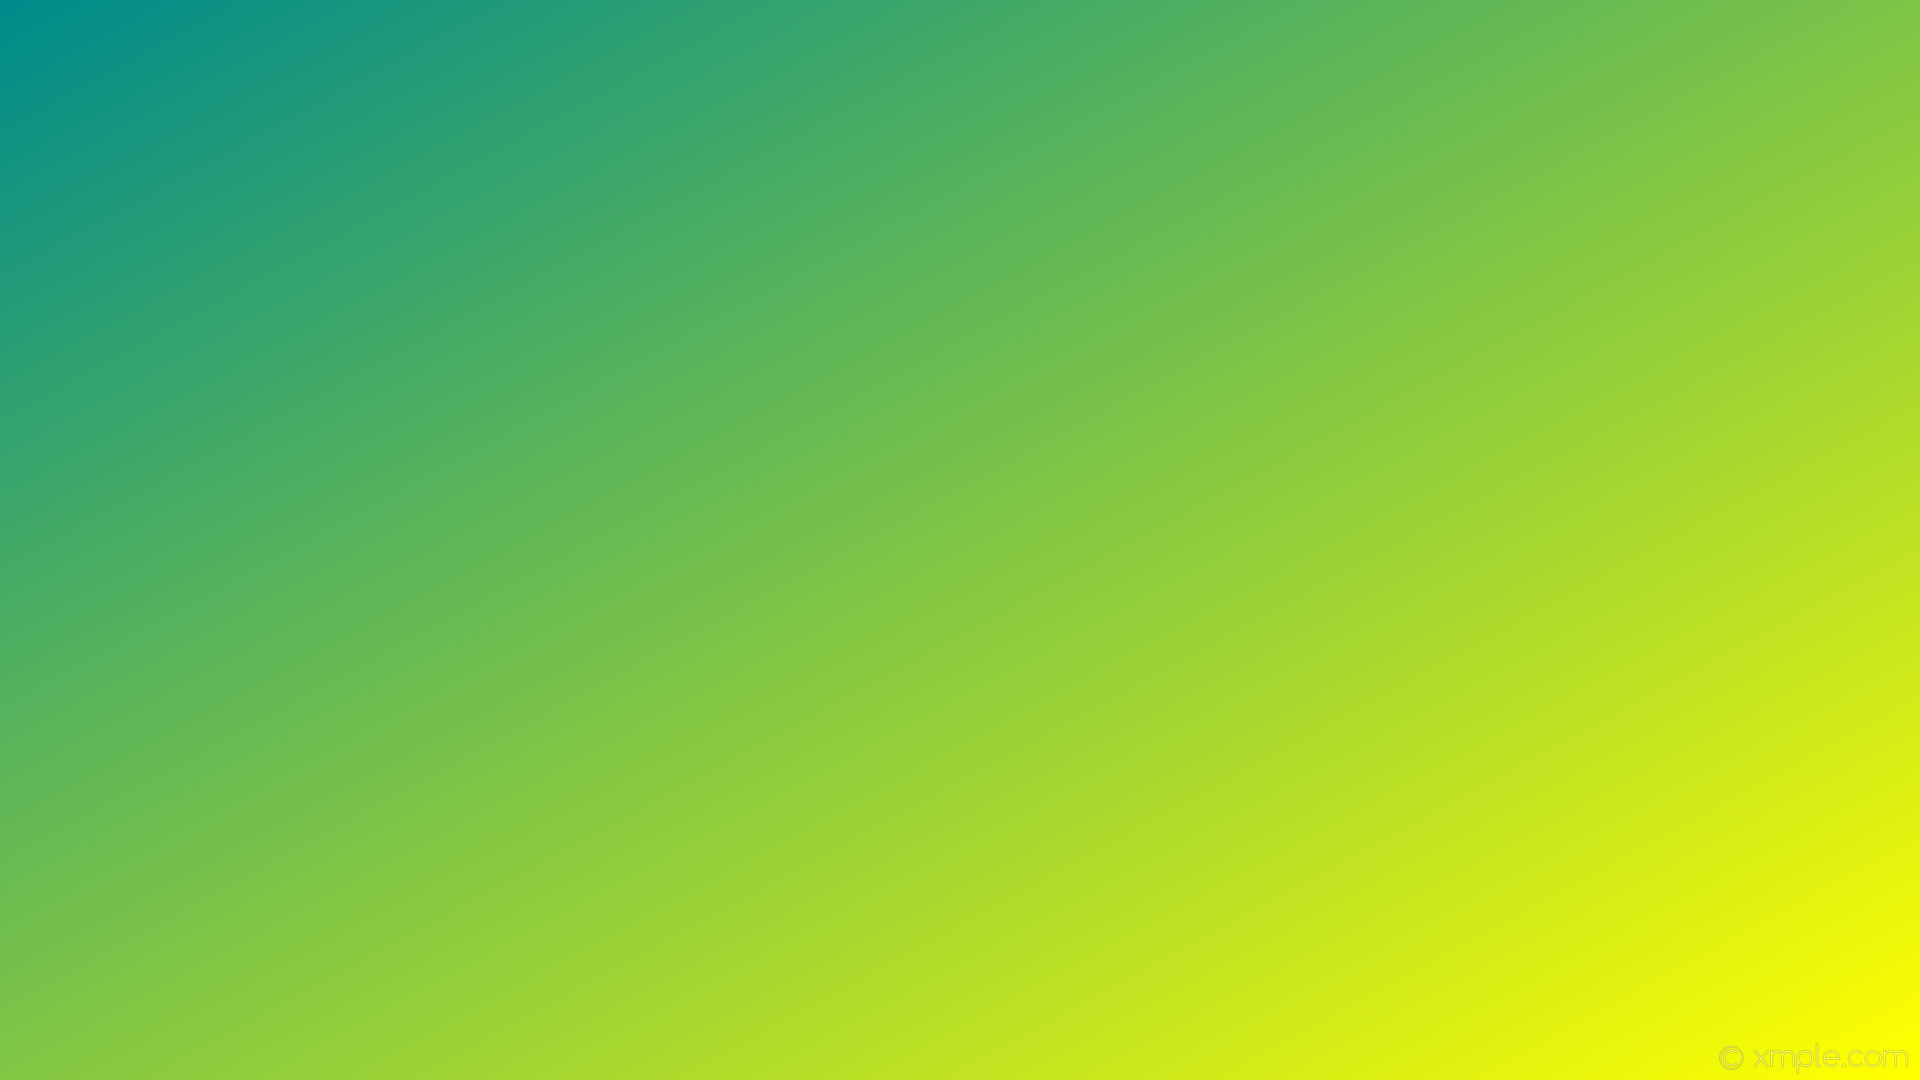 Wallpaper Gradient Green Yellow Linear Dark Cyan - Color Gradient Green Yellow - HD Wallpaper